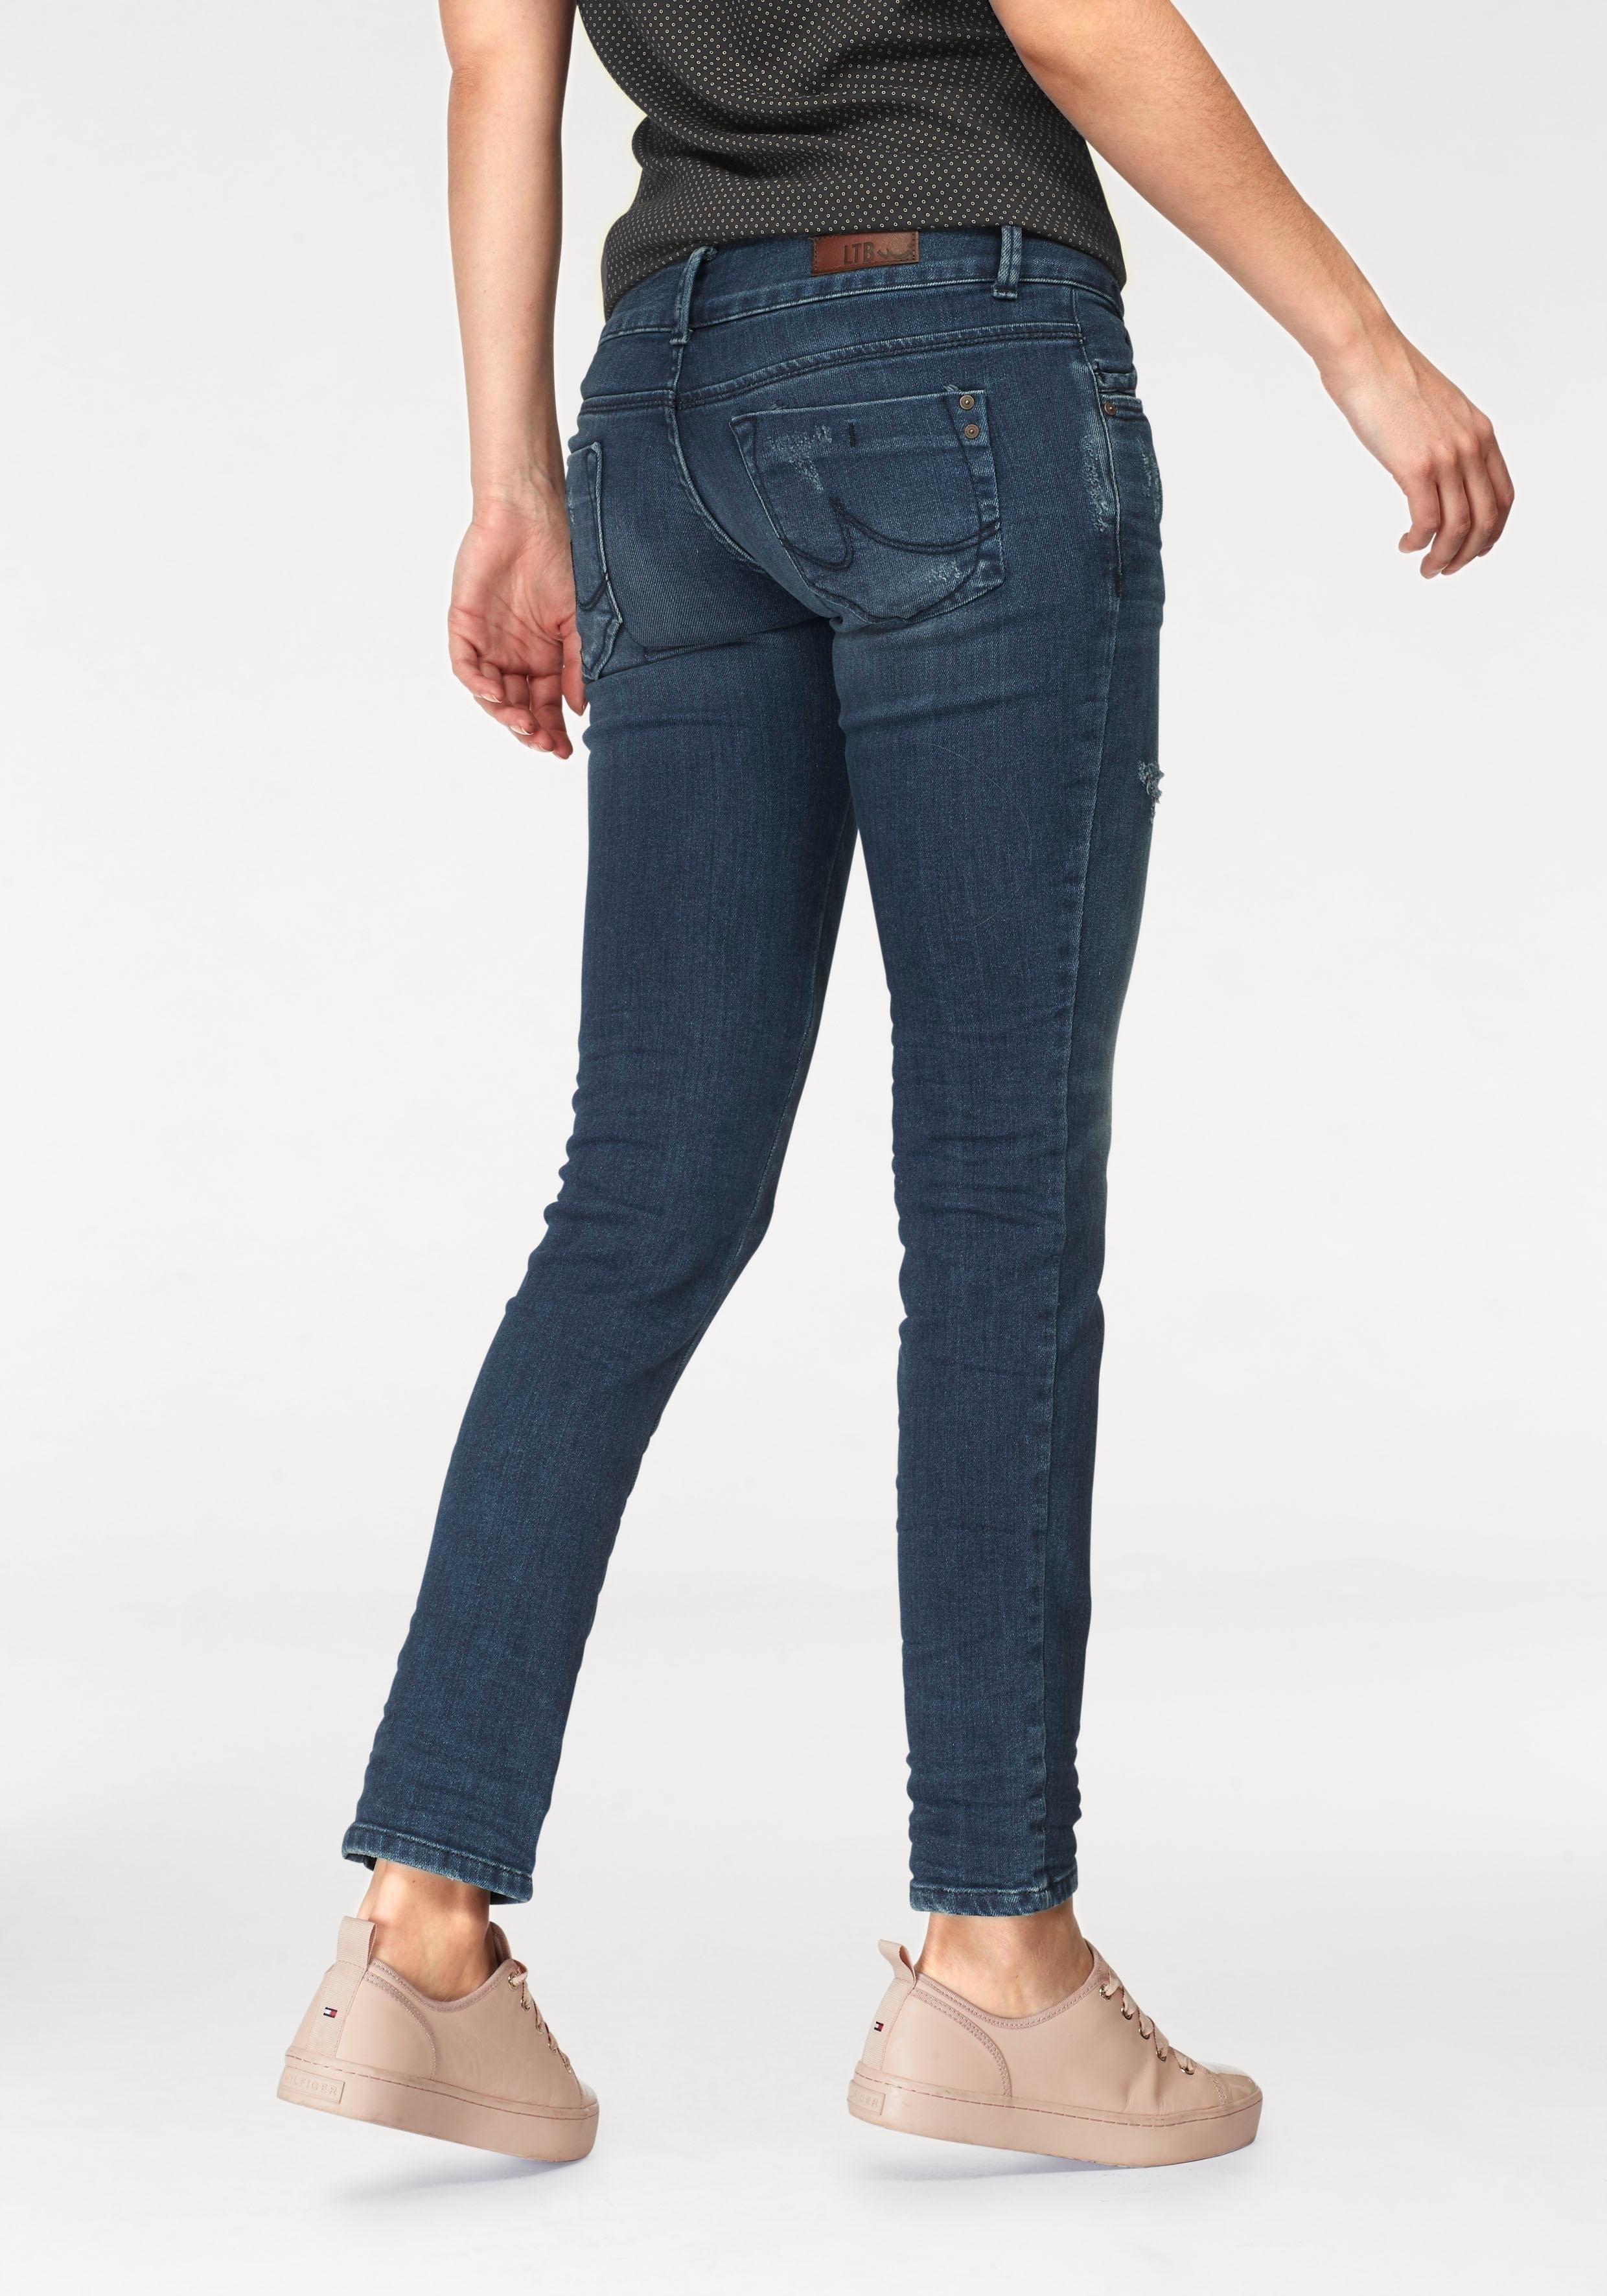 LTB Slim-Fit-jeans »MOLLY« voordelig en veilig online kopen